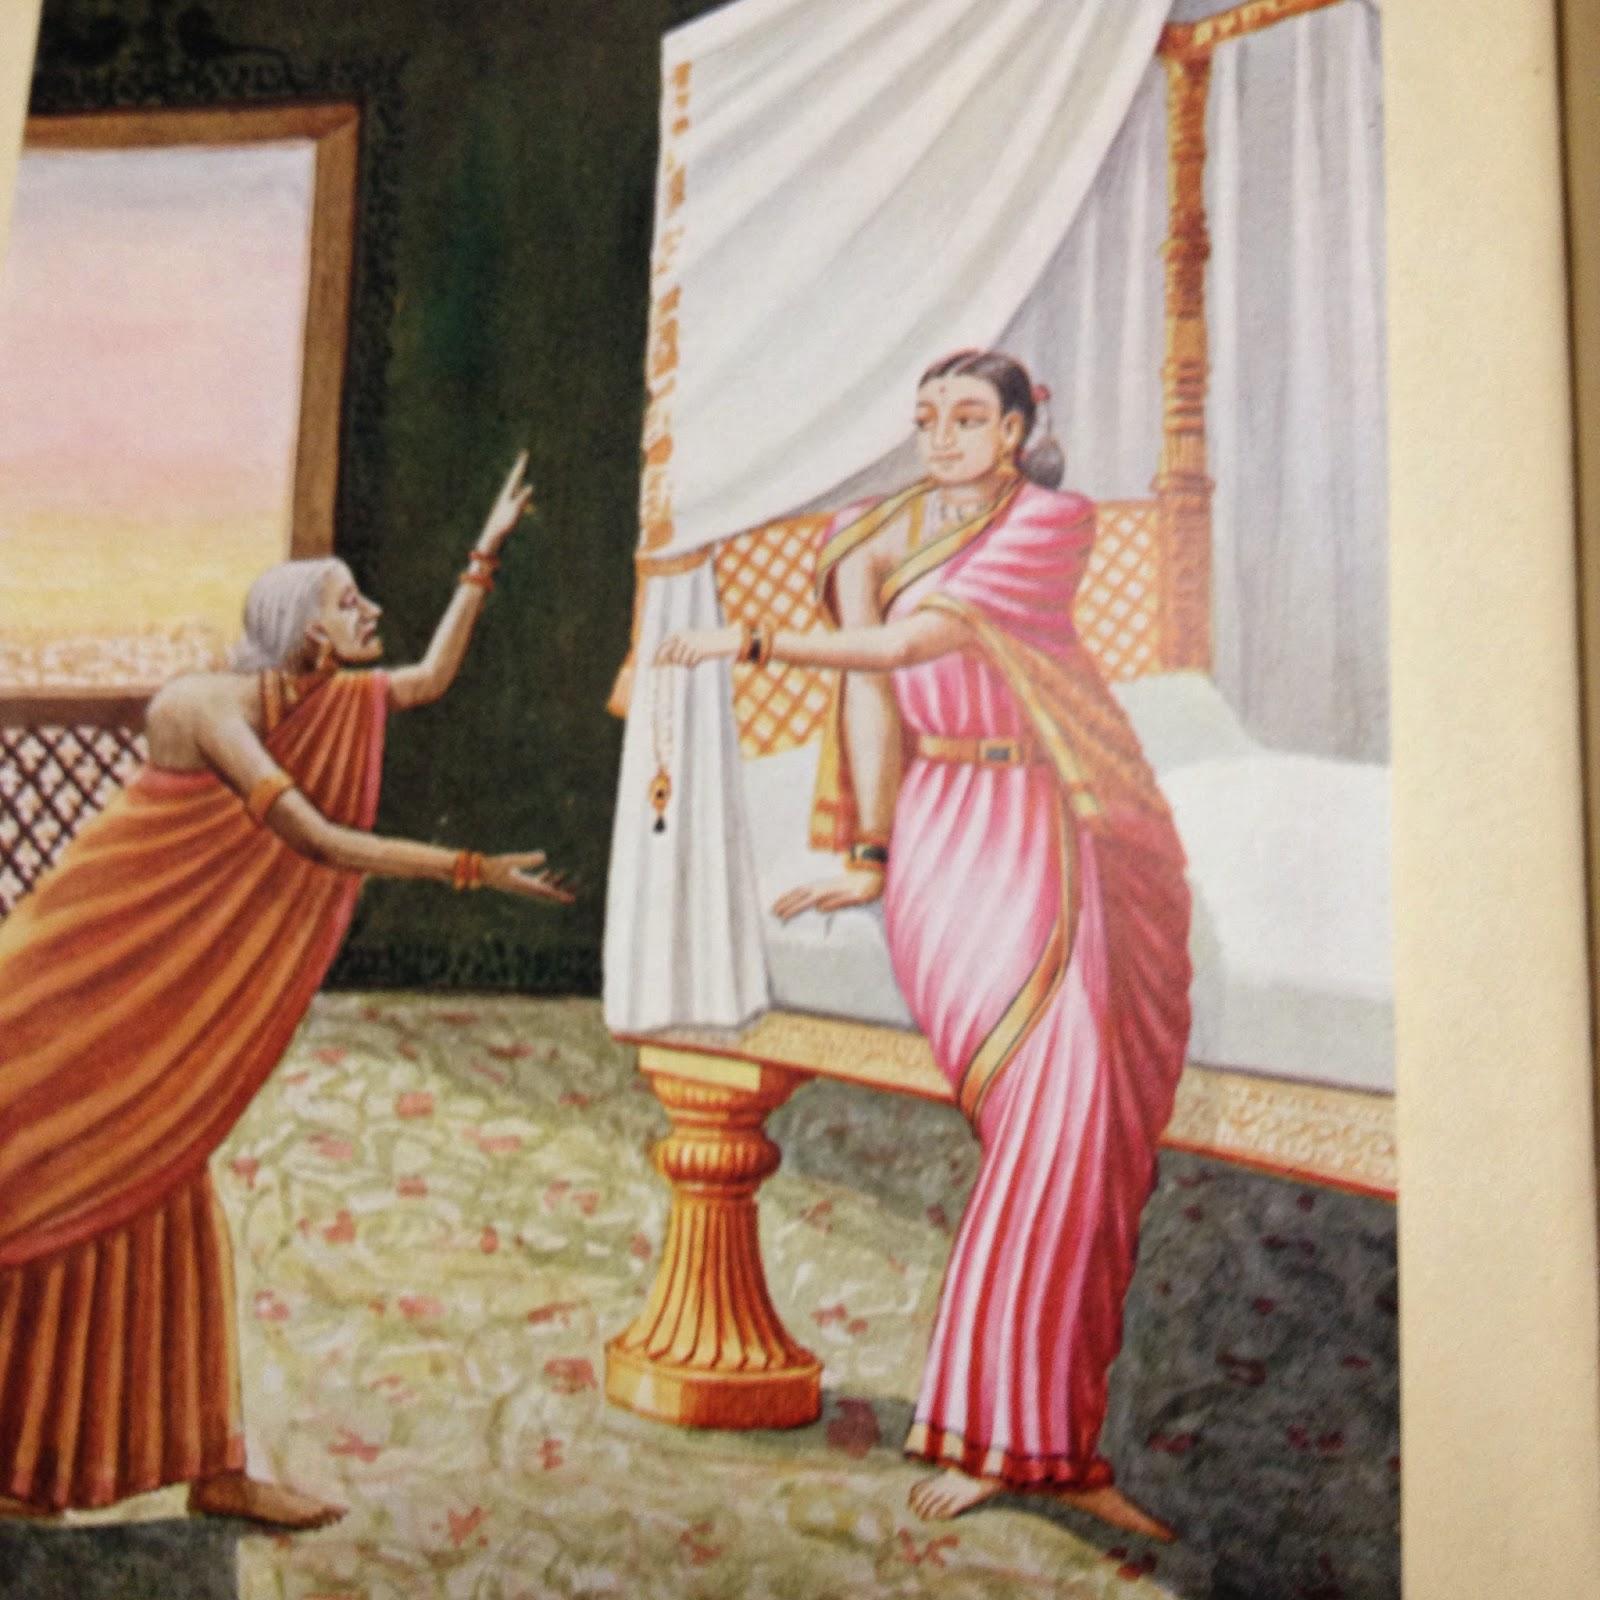 Error Log: Swami's Indology Blog: Ayodhya Kanda Of Ramayana In Pictures